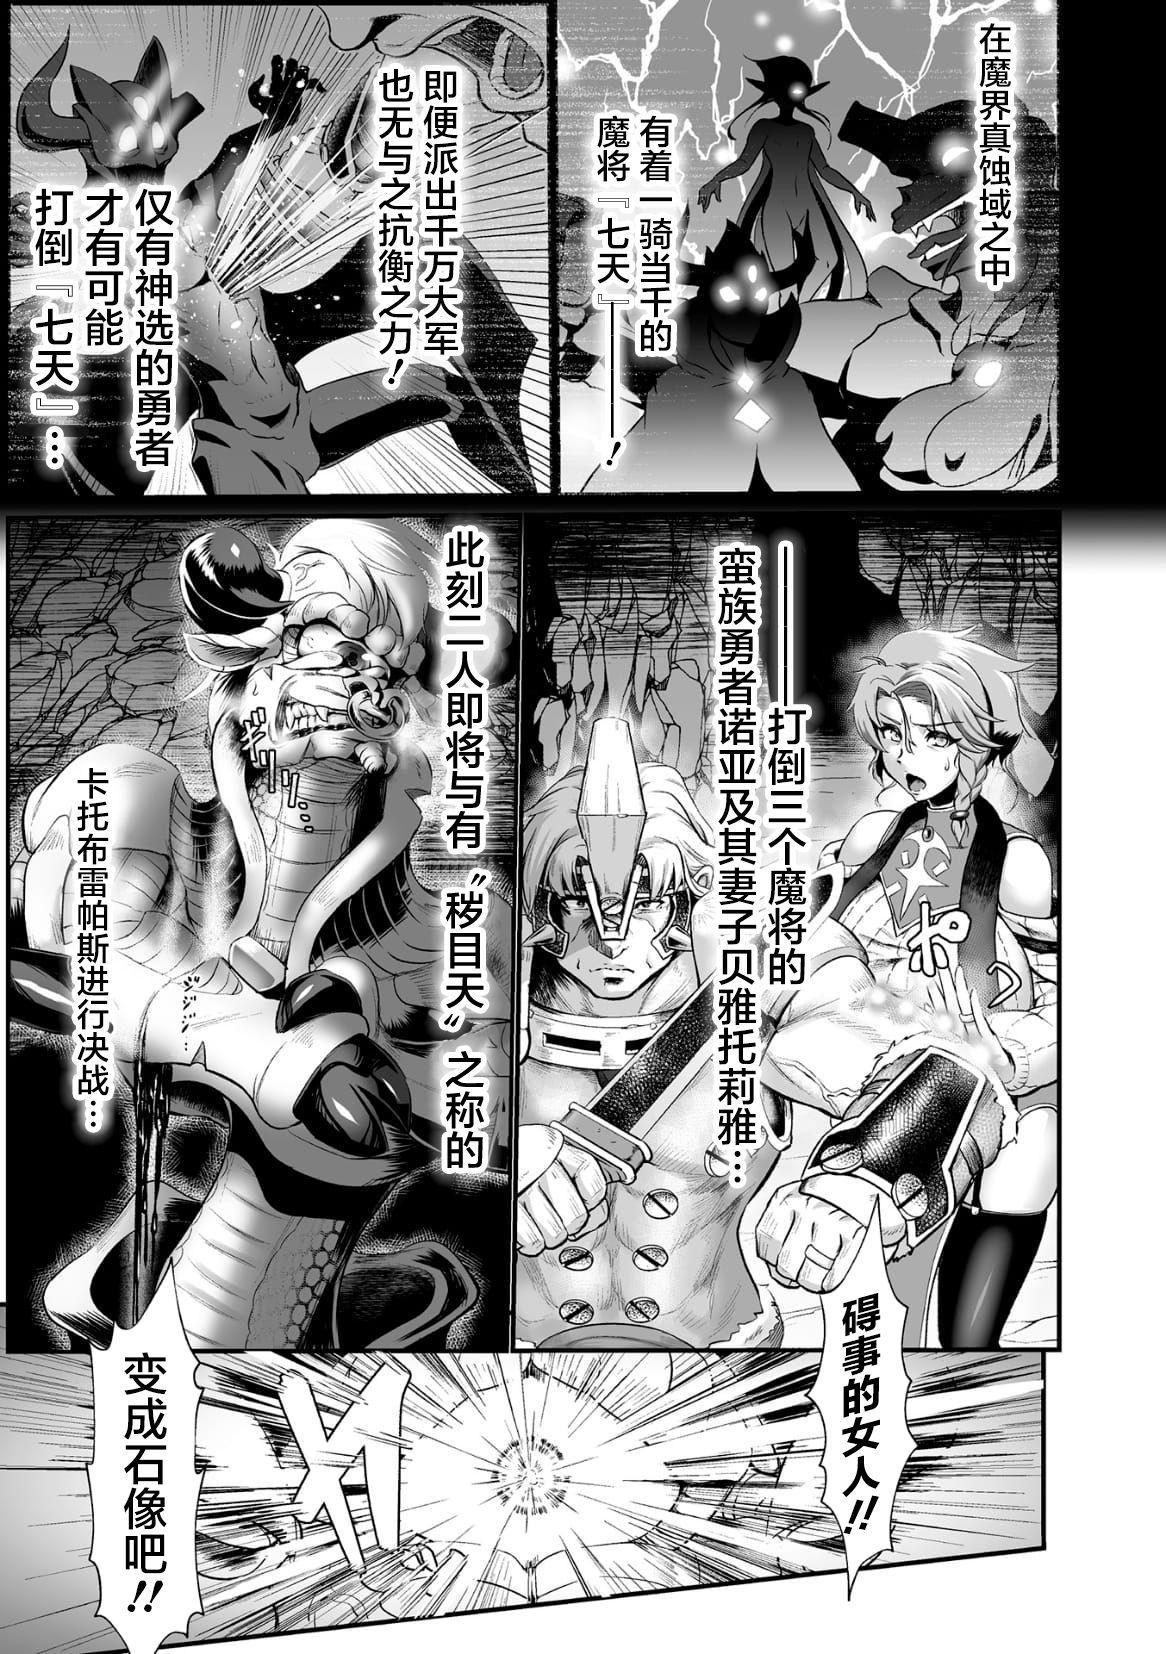 [Mou] Sekkan Fuuin ~Enbi na Sekizou ni Otosareshi Yuusha Ichizoku~ Ch. 1 [Chinese] [不咕鸟汉化组] 2